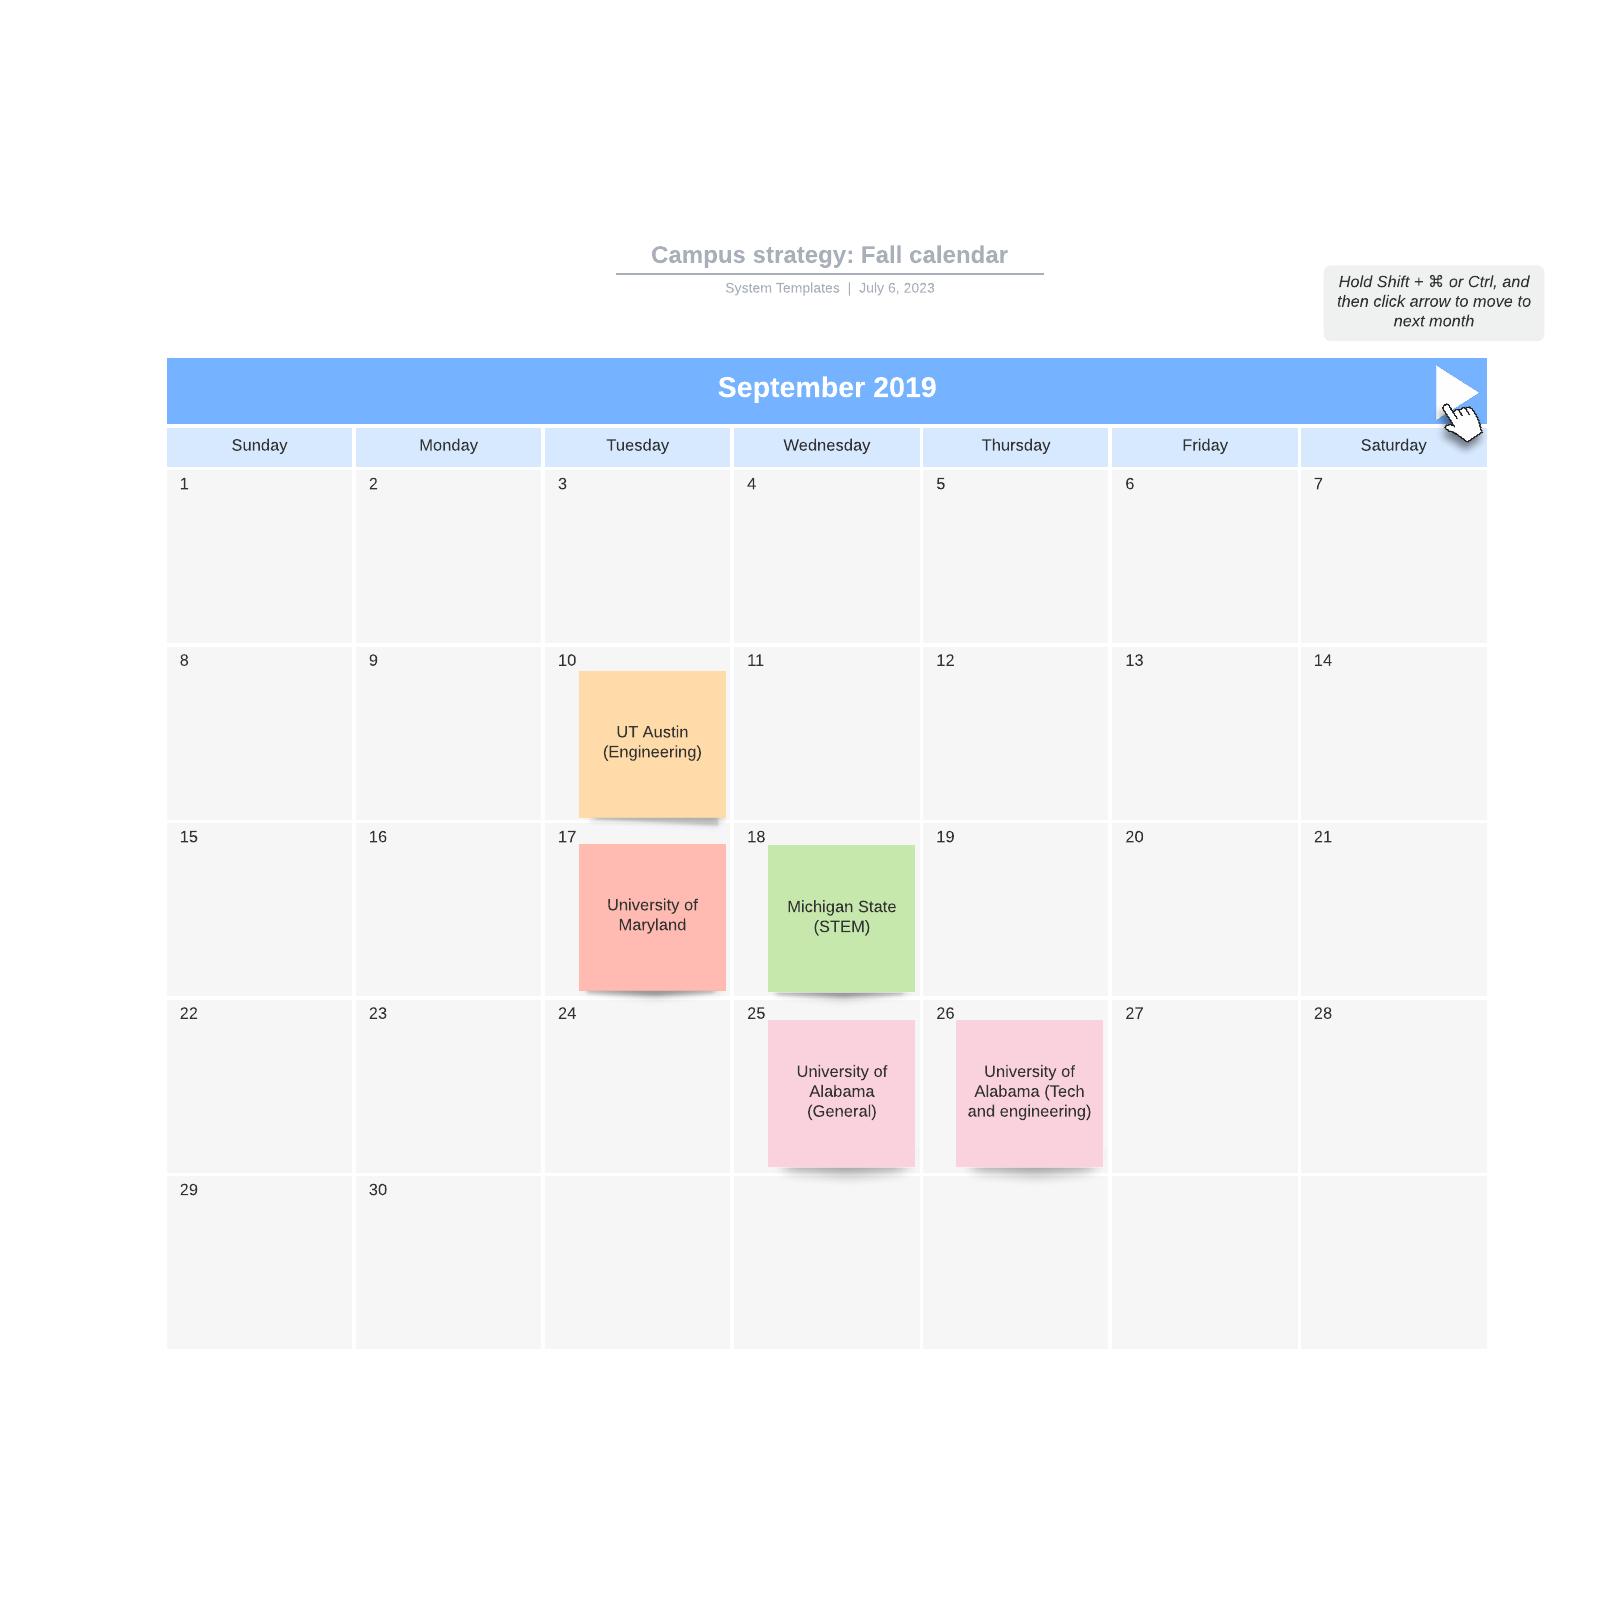 Campus strategy: Fall calendar